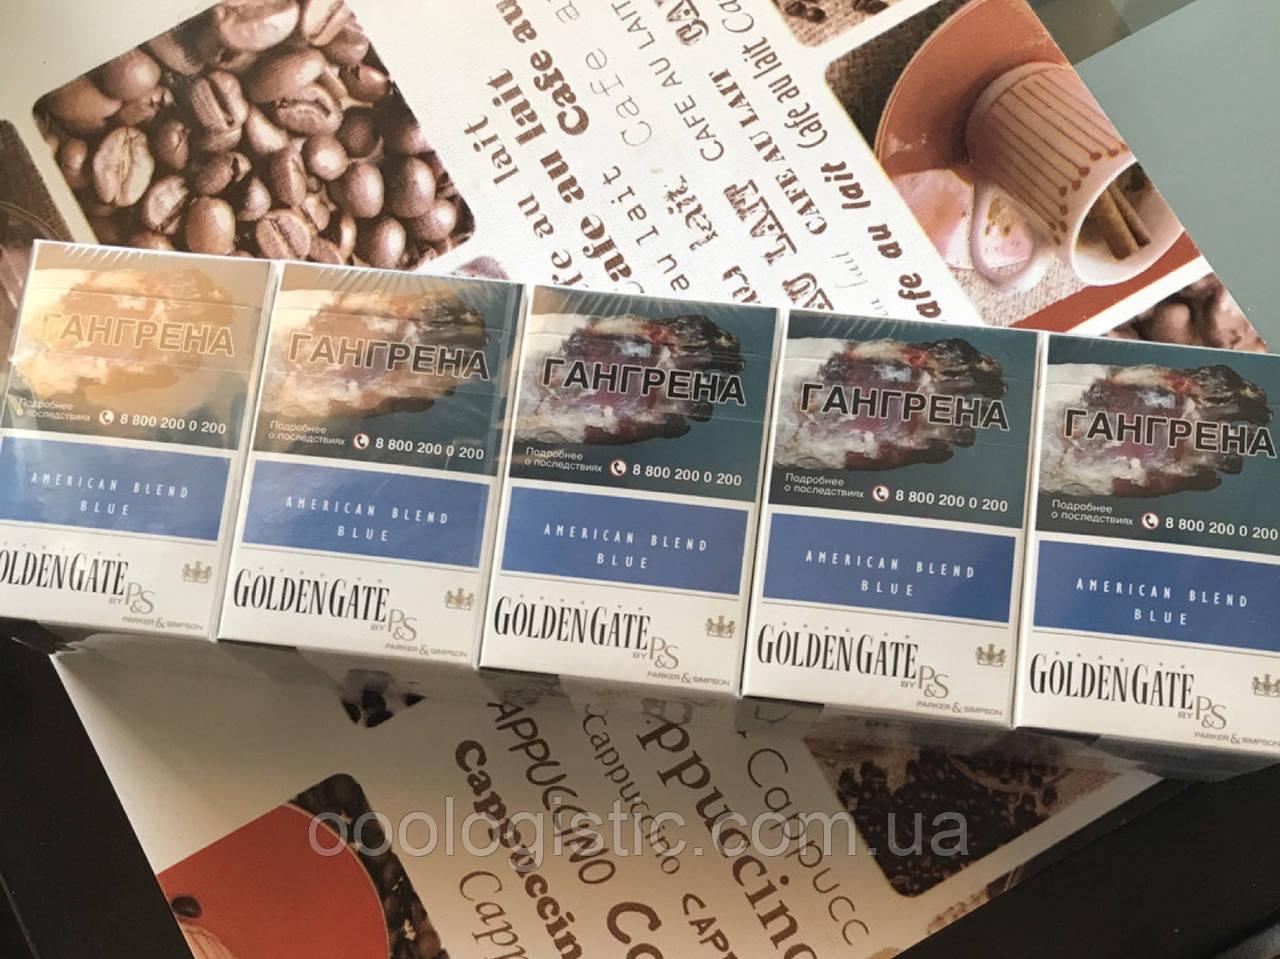 Сигареты Golden Gate Blue блок 10 пачек duty free Германия, фото 1